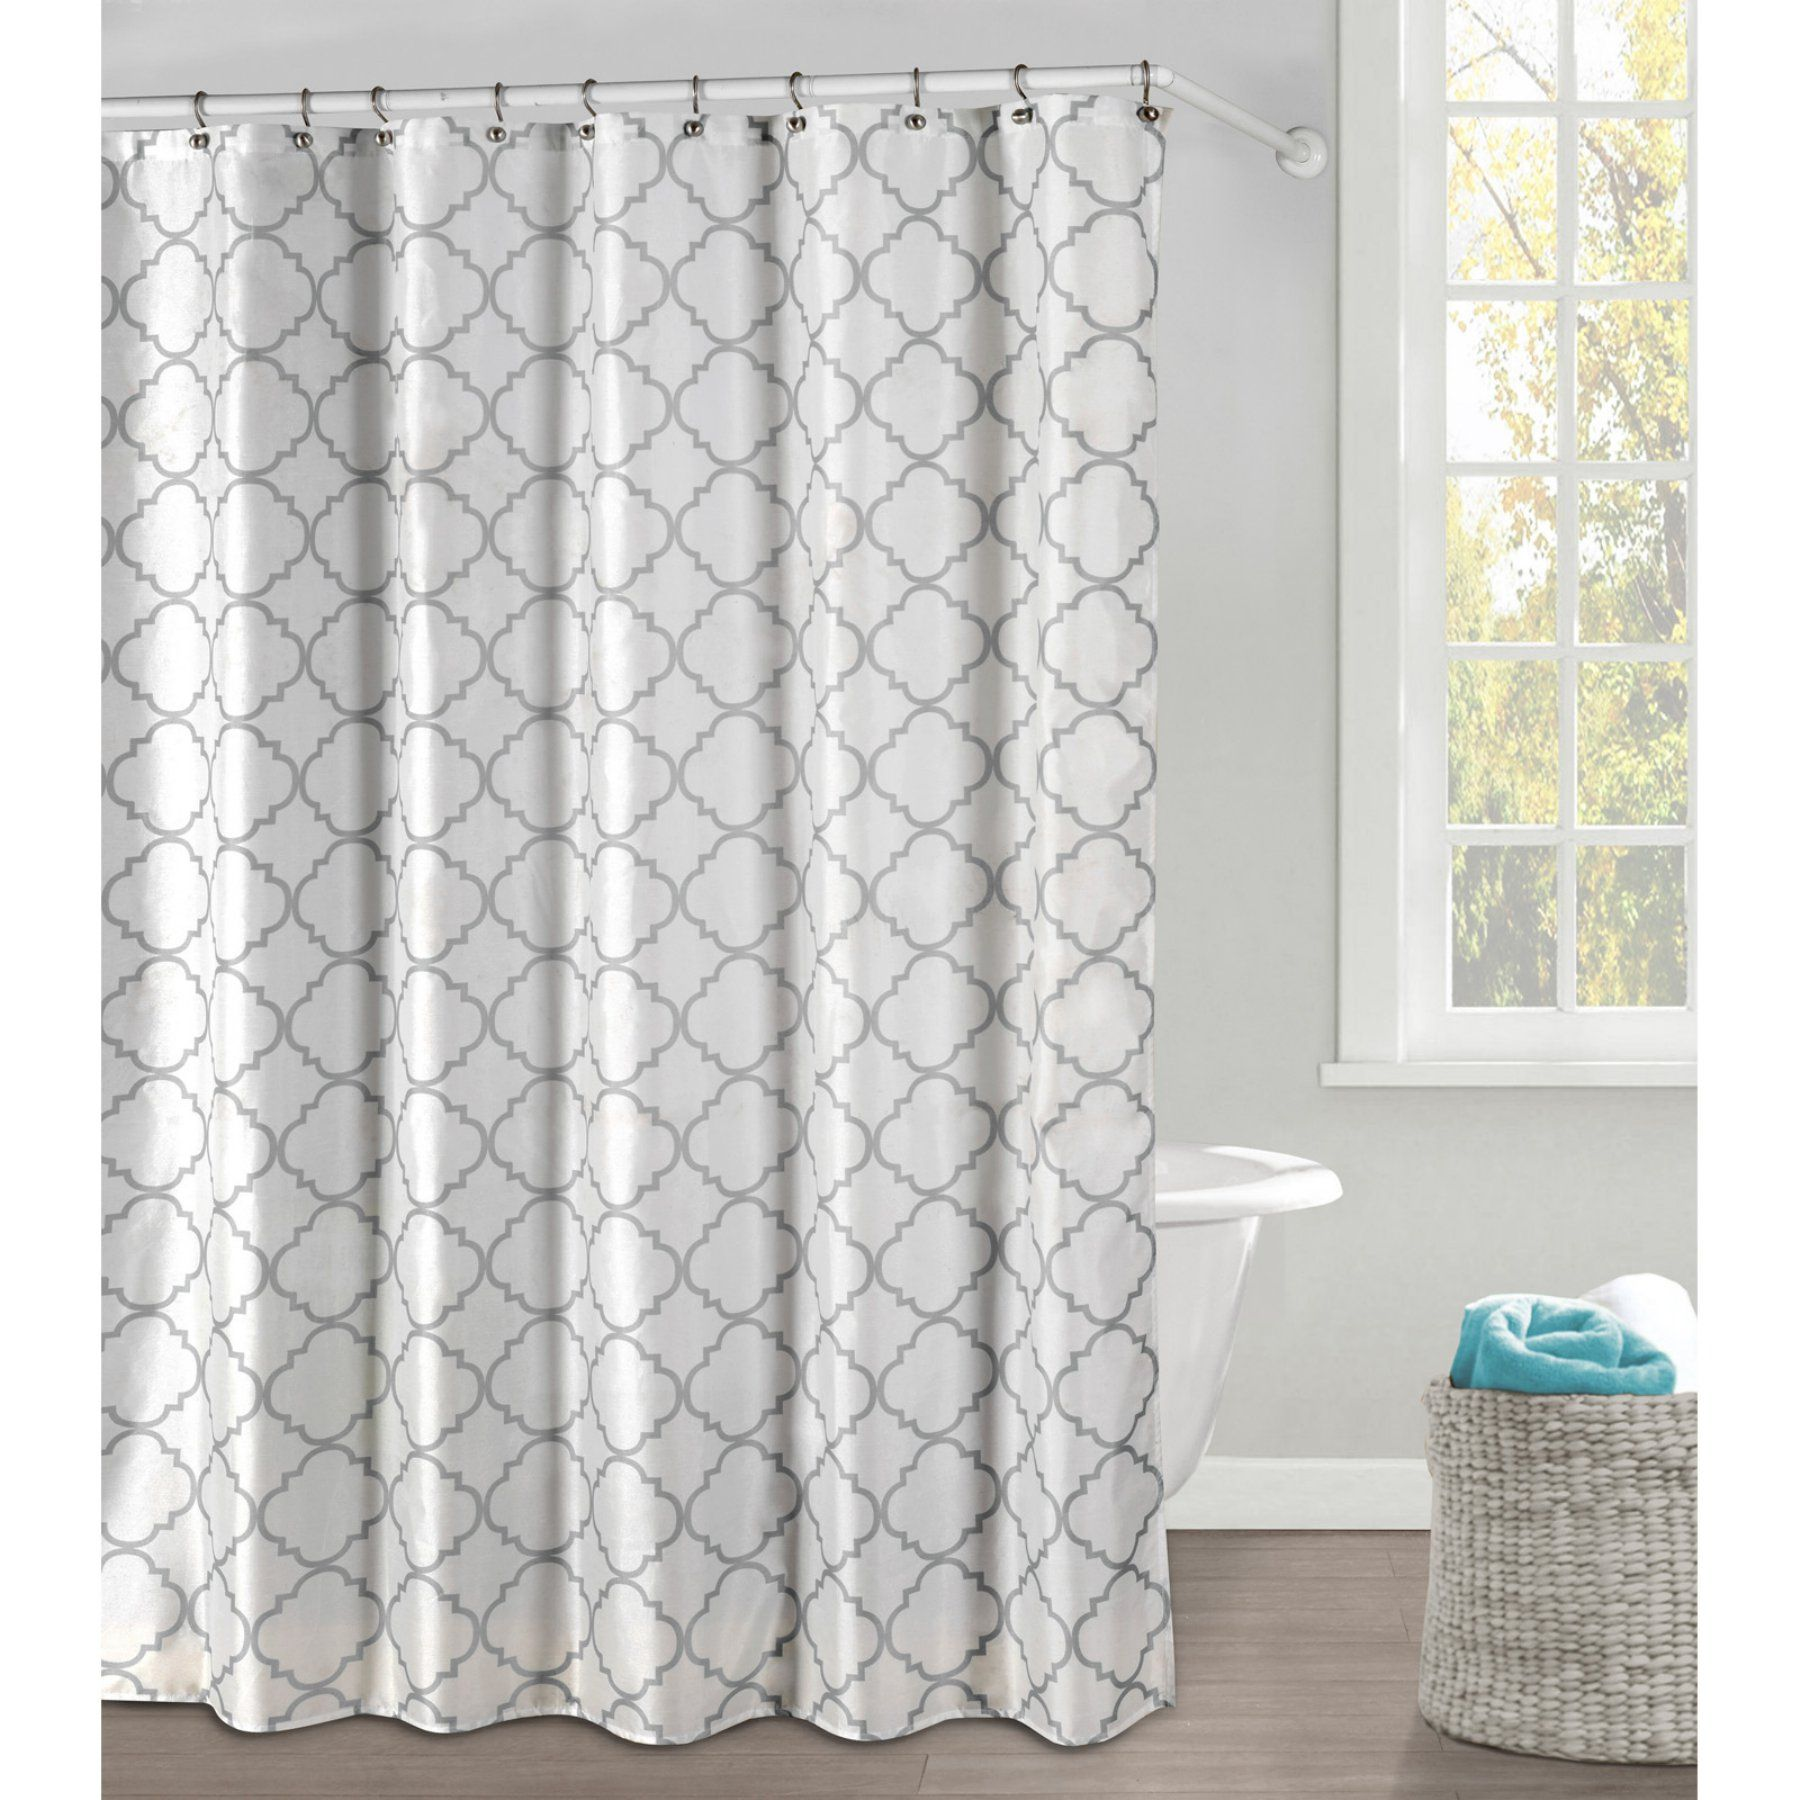 Duck River Magalie Shower Curtain Masgy 12 2974 Shower Curtain Sets Curtains Curtain Inspiration